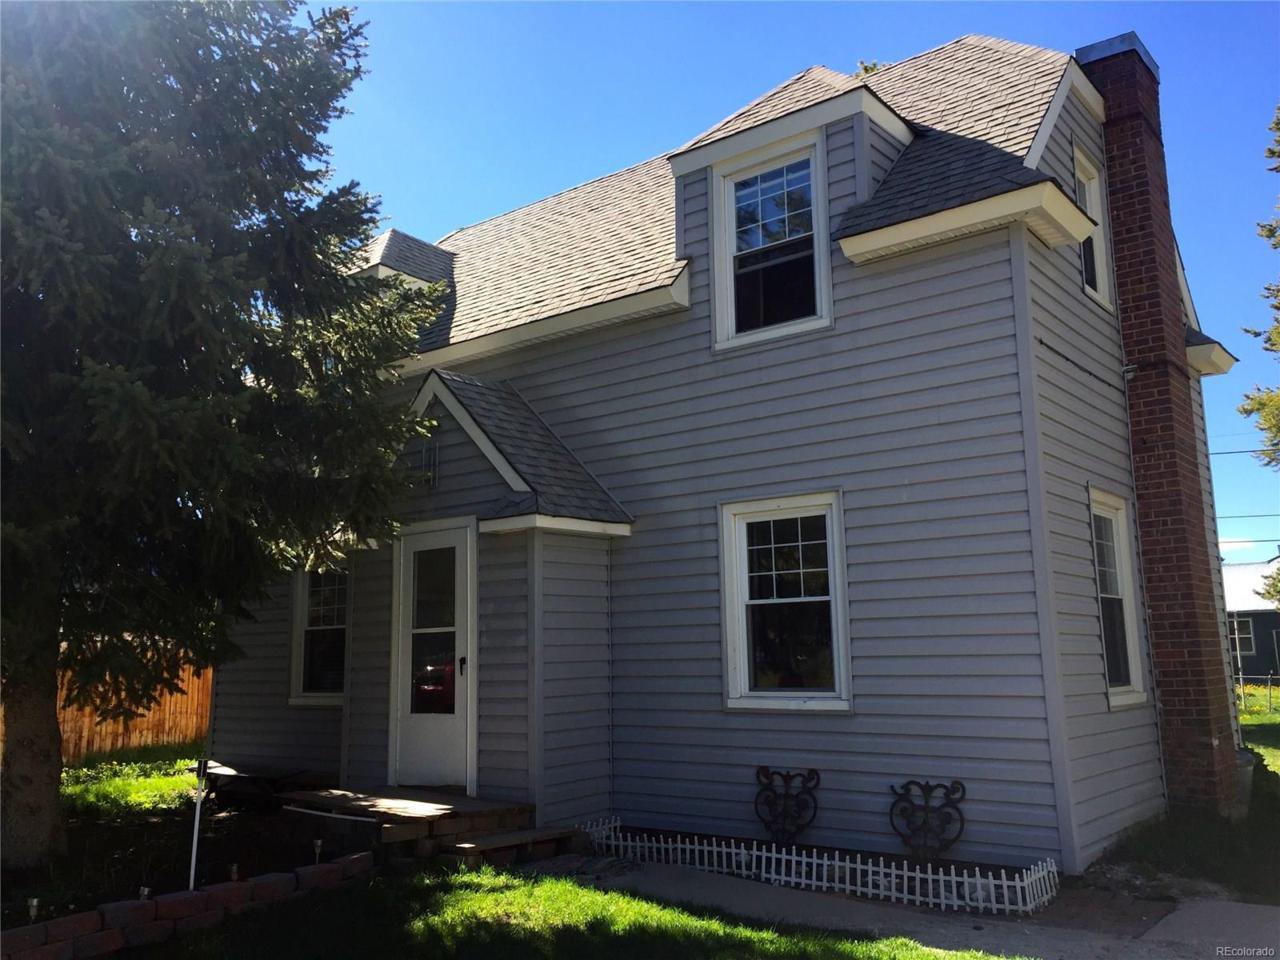 304 Mount Traver Drive, Leadville, CO 80461 (MLS #6175112) :: 8z Real Estate